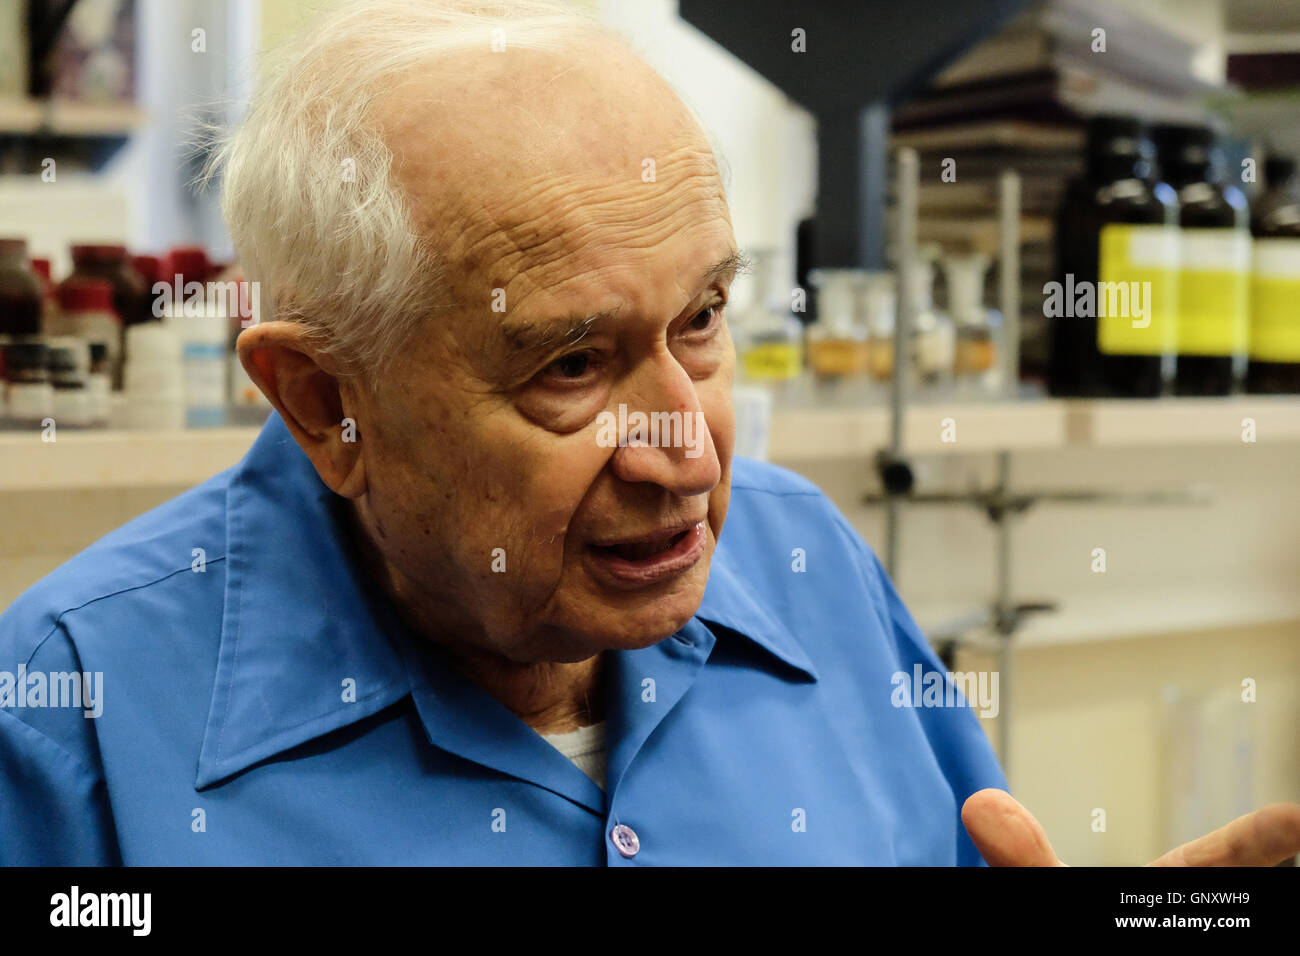 Jerusalem, Israel. 1st September, 2016. World renown Professor RAPHAEL MECHOULAM, 86, is depicted in his Laboratory - Stock Image